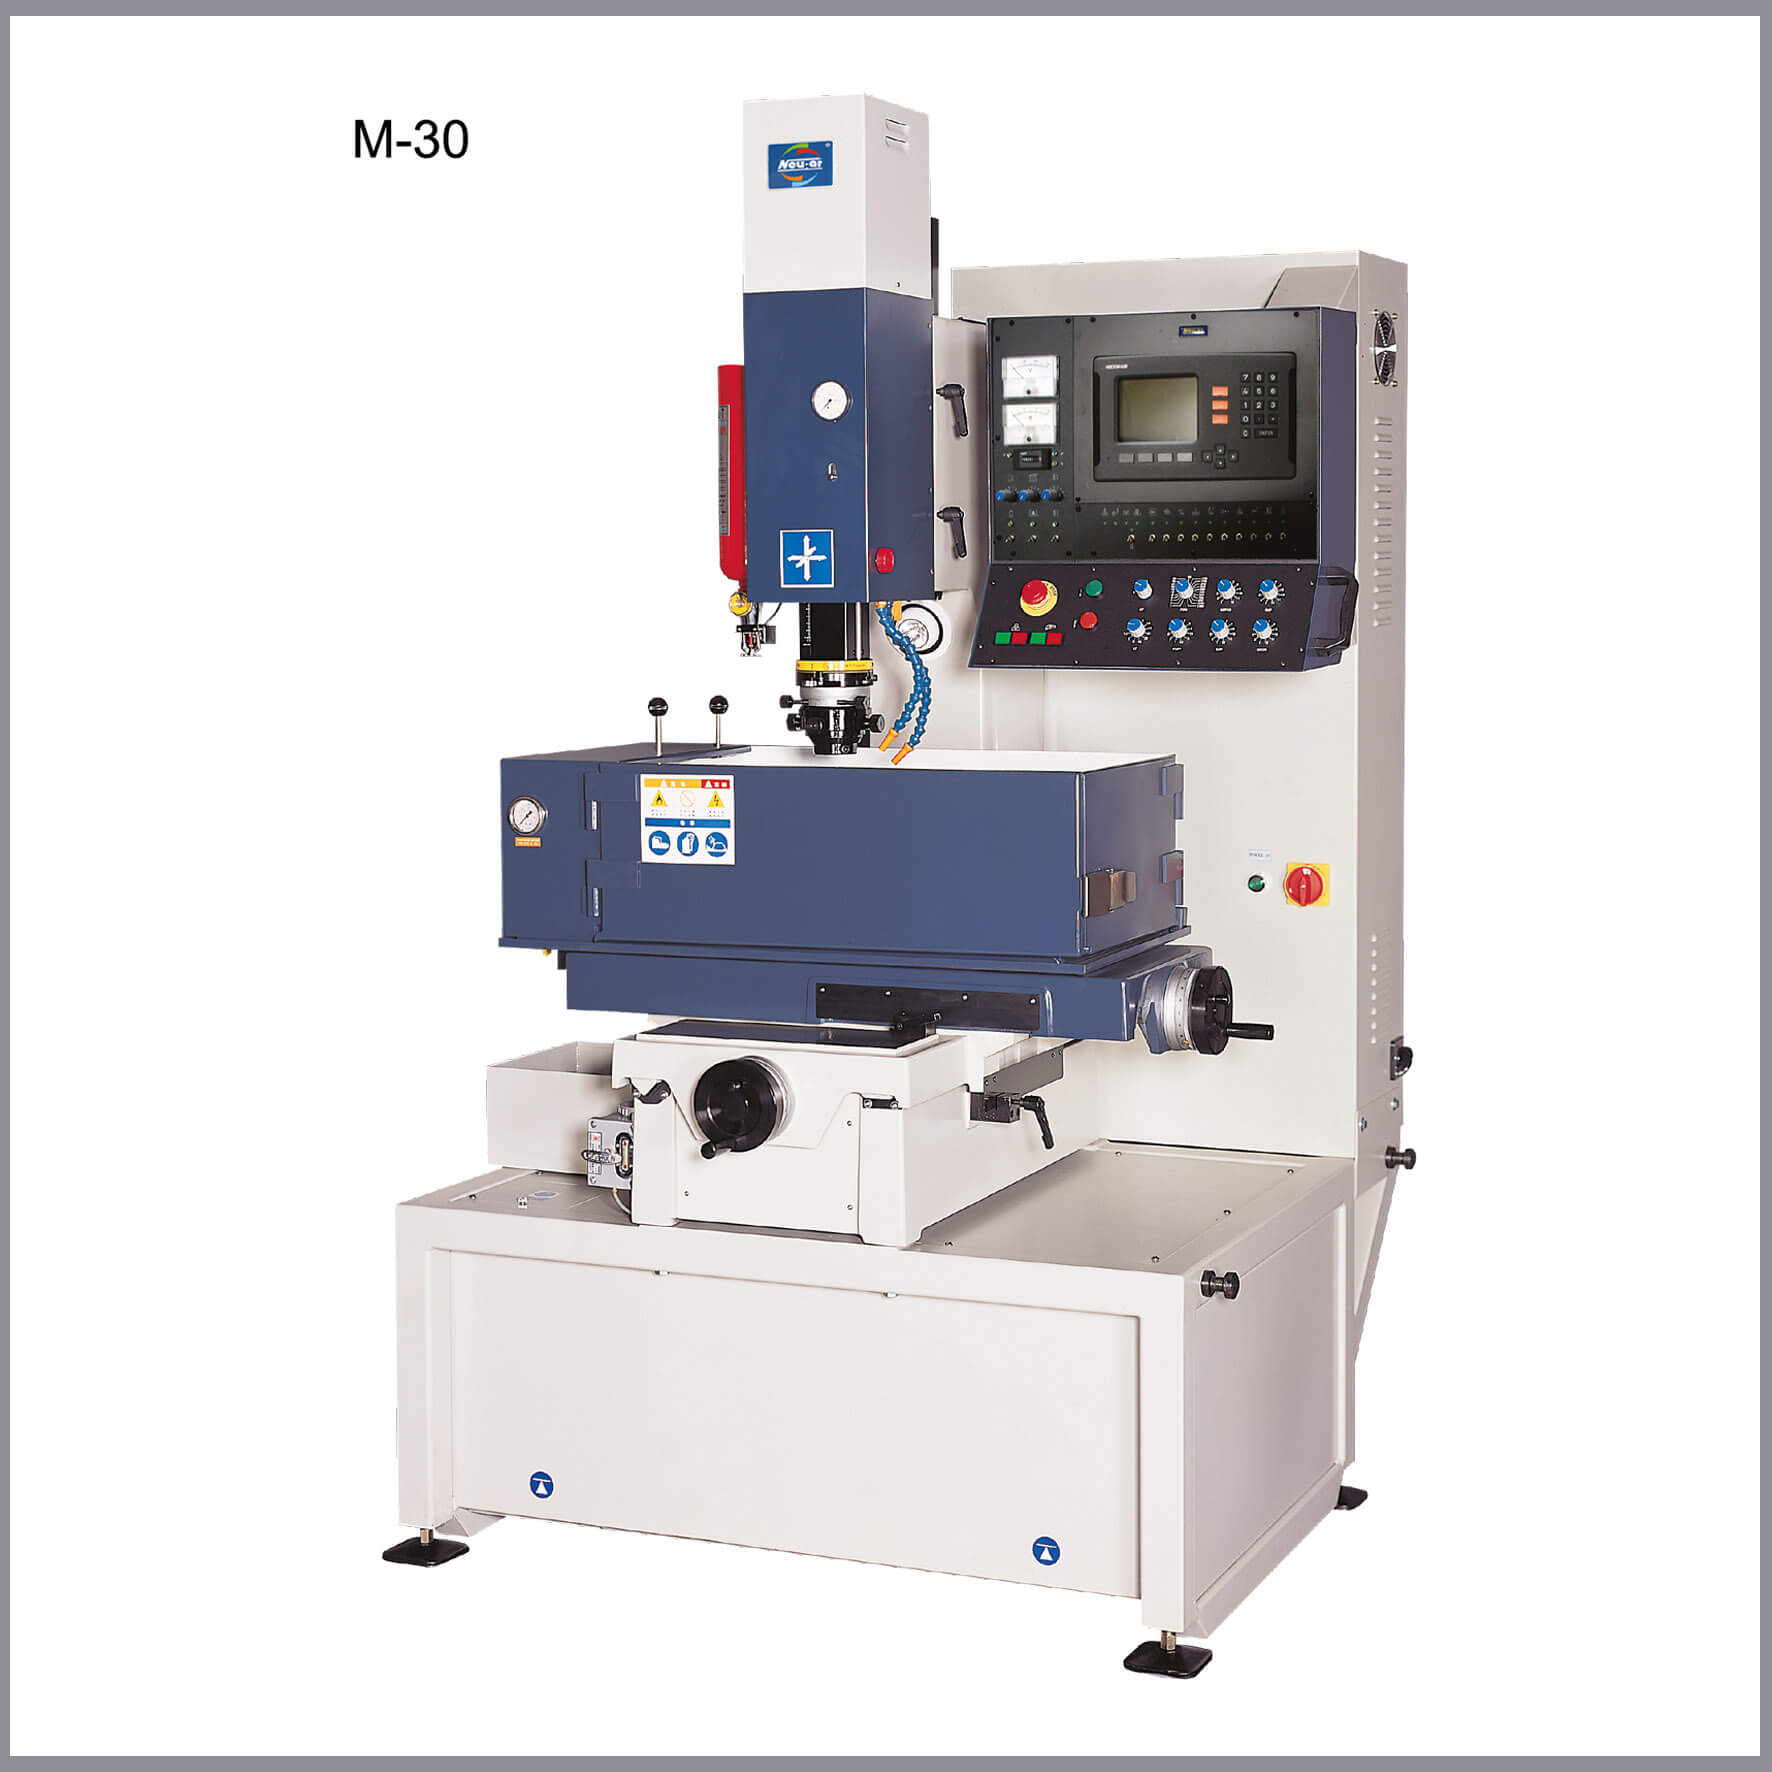 NEUAR CNC-M30 250 x 200 x 200 mm